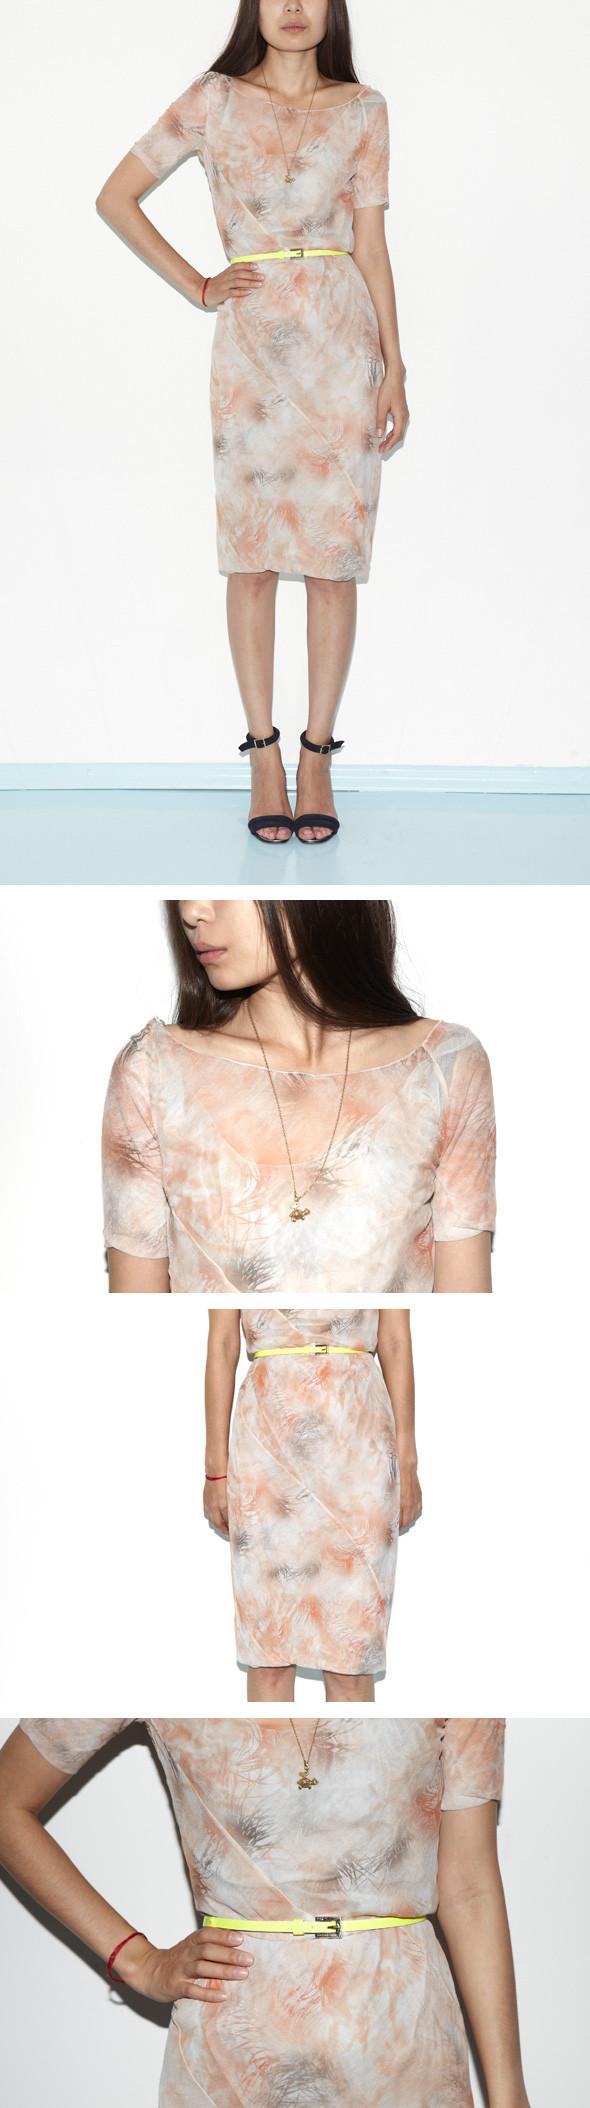 Гардероб: Джига Санжиева, младший редактор моды журнала In Style. Изображение № 4.